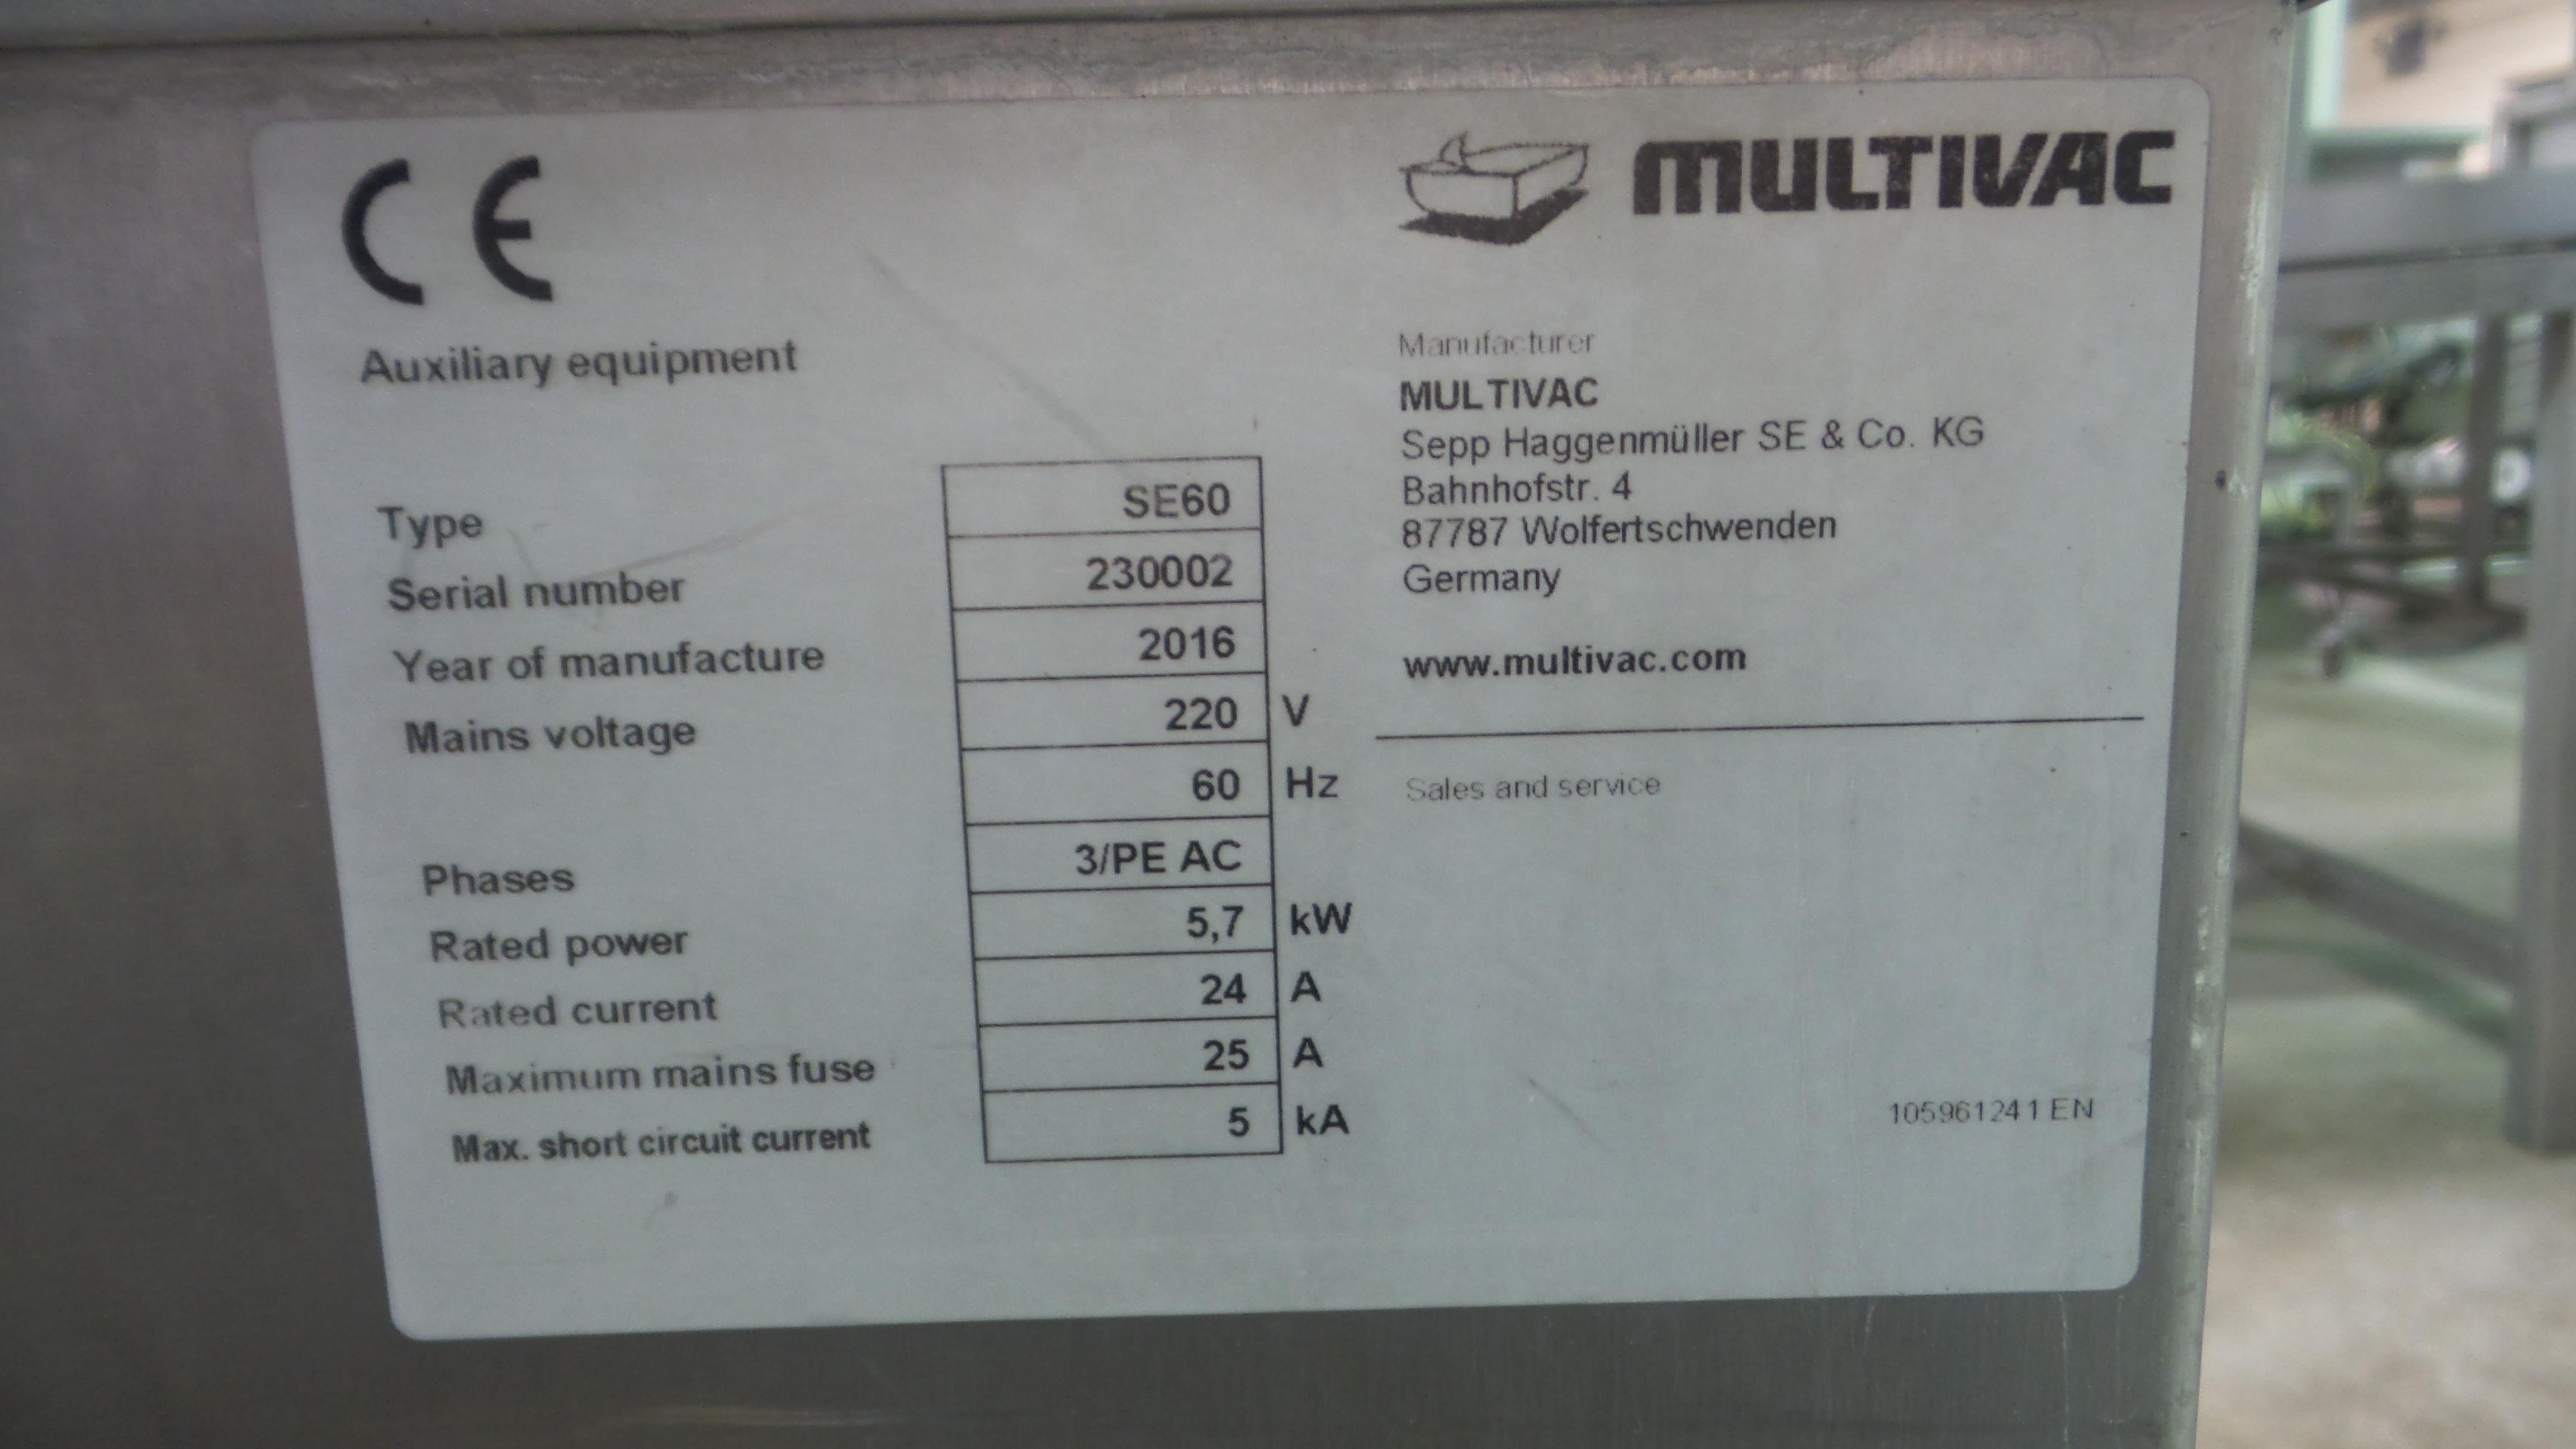 Lot 6 - Multivac Mdl. SE60 Dip Tank, touchscreen controls, foot pedal activation220 volt, 3 phase, Ser. #